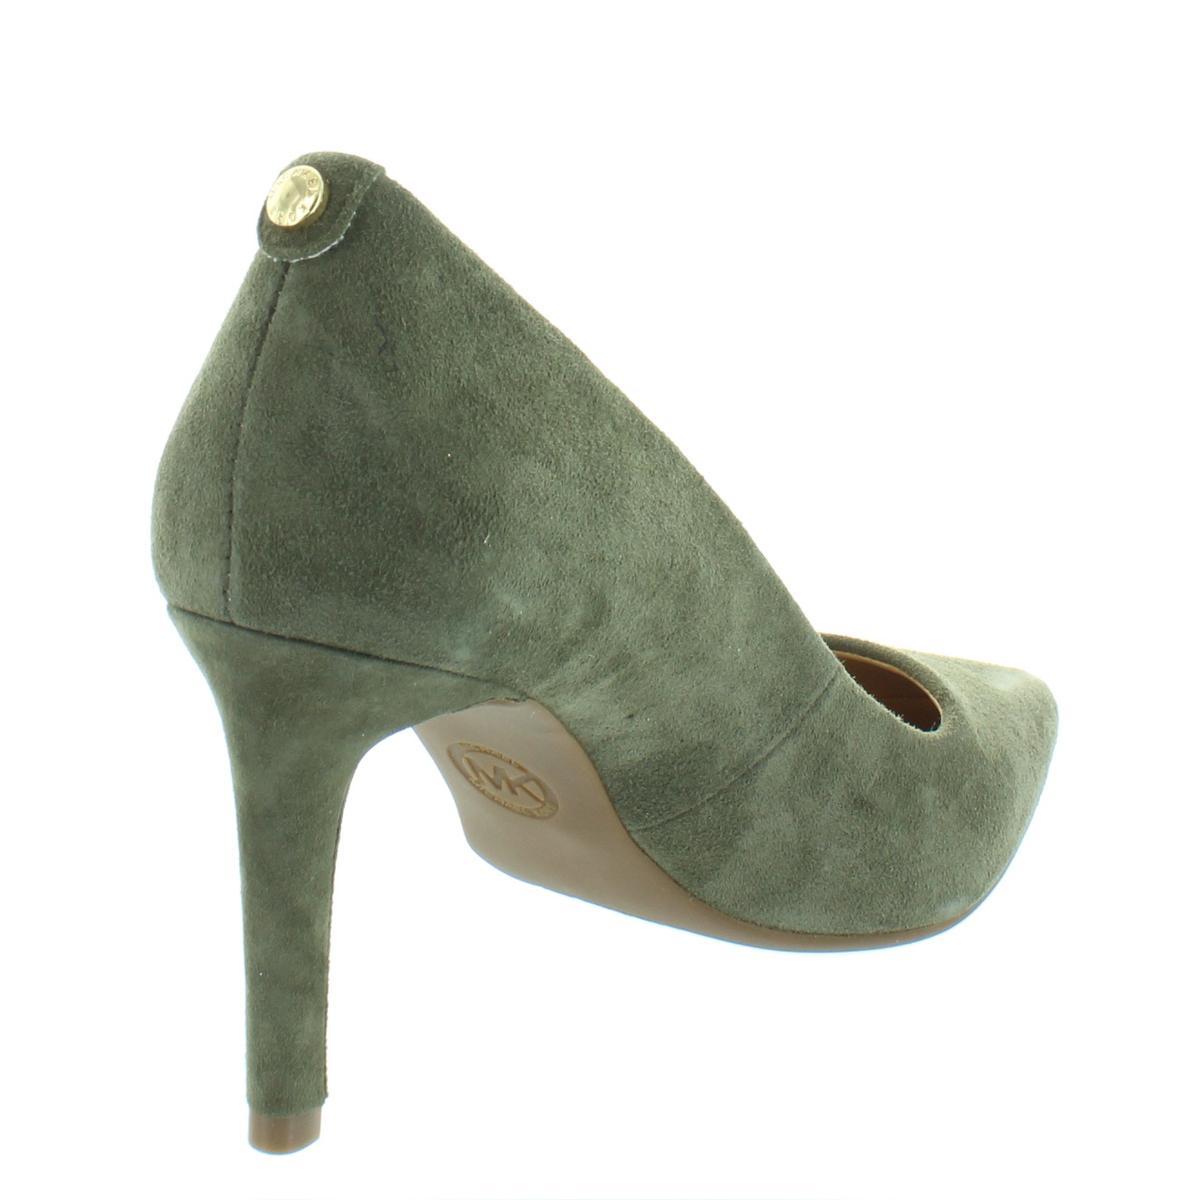 MICHAEL-Michael-Kors-Womens-Dorothy-Suede-Pumps-Dress-Heels-Shoes-BHFO-6408 thumbnail 8